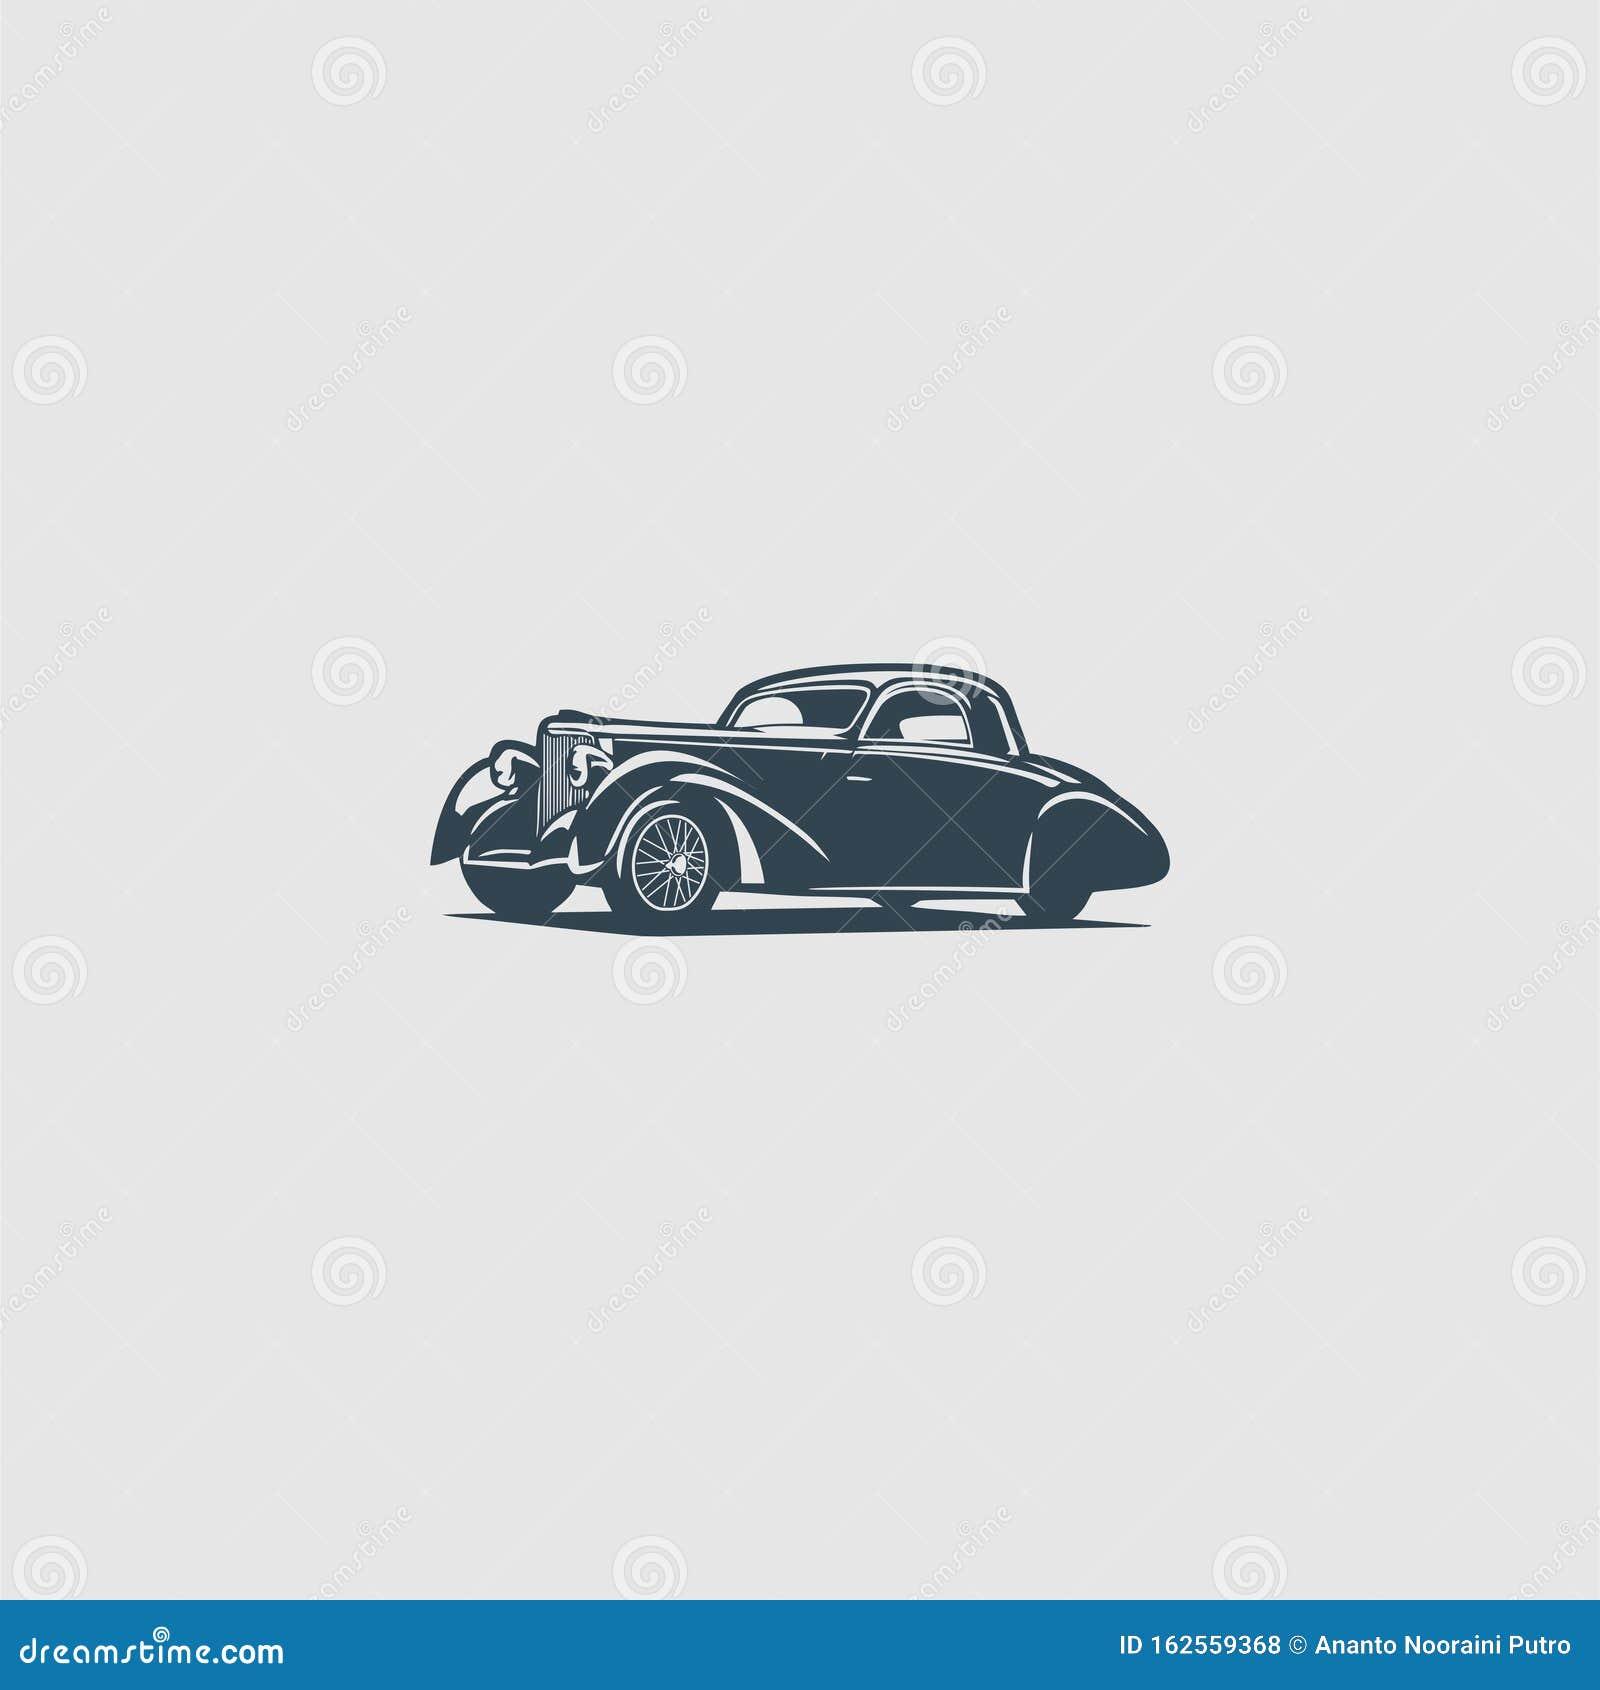 Old Mobile Monogram Design Logo Inspiration Stock Vector Illustration Of Element Muscle 162559368